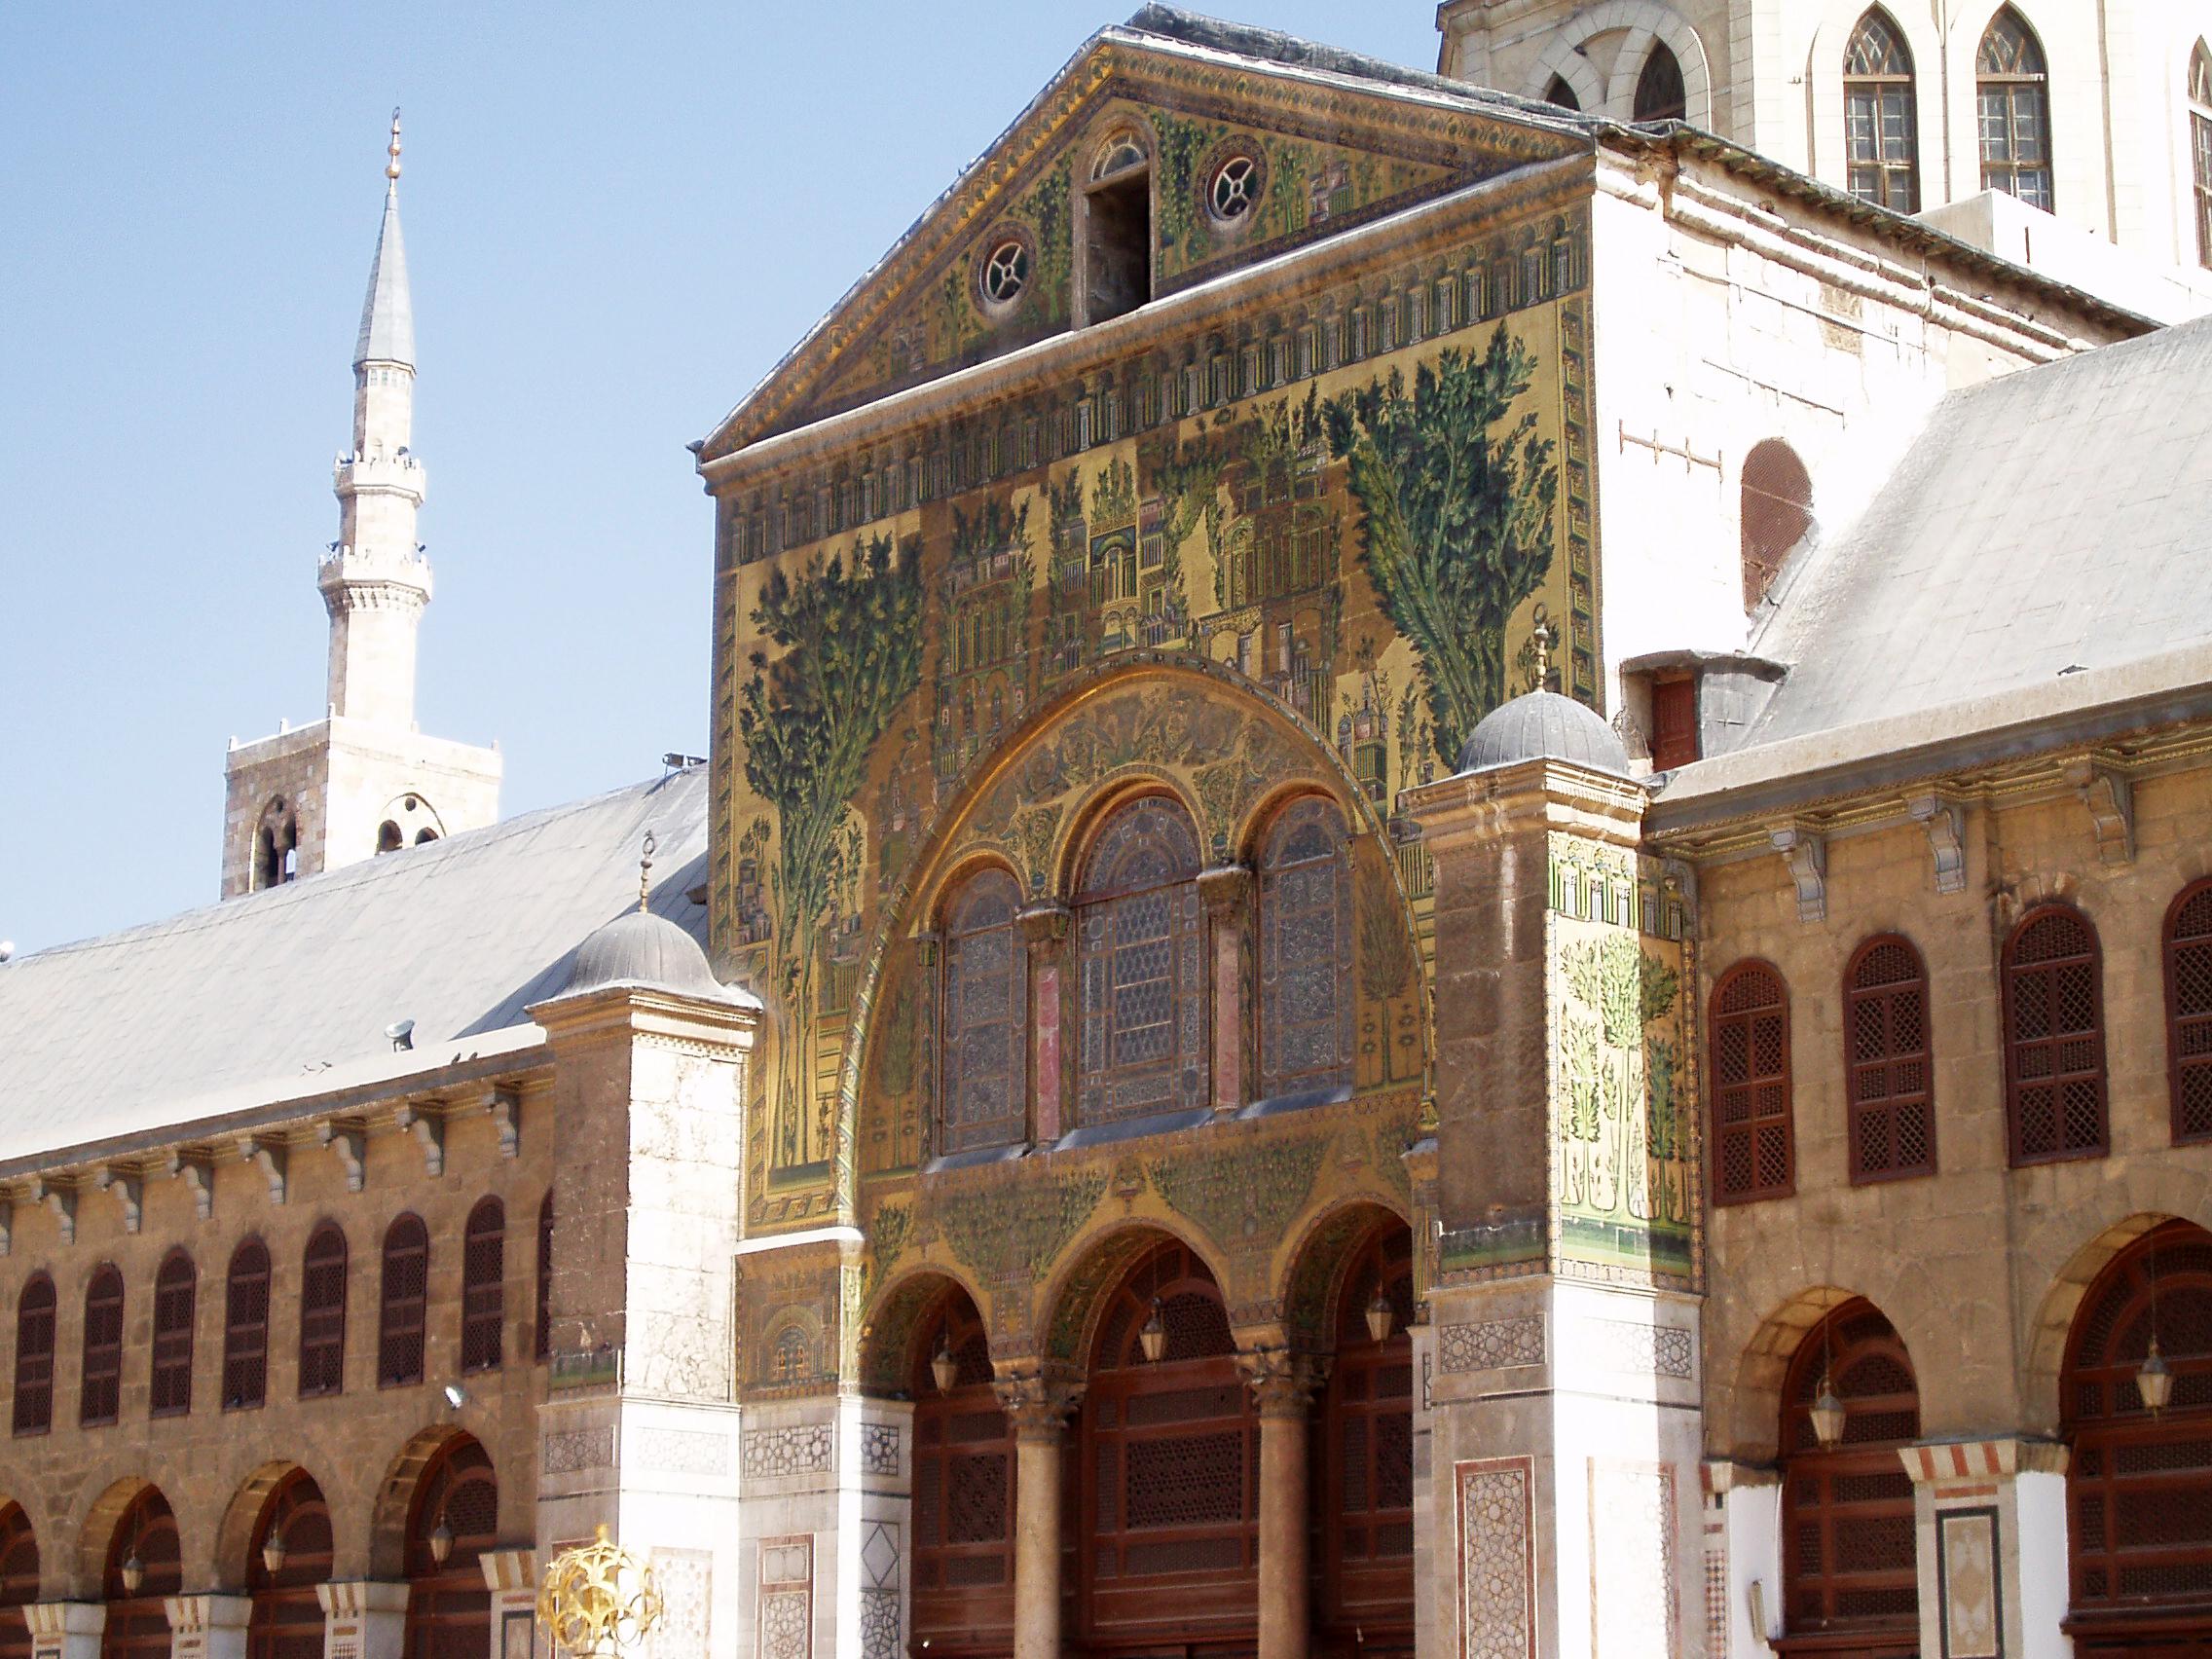 Image: Mosque exterior